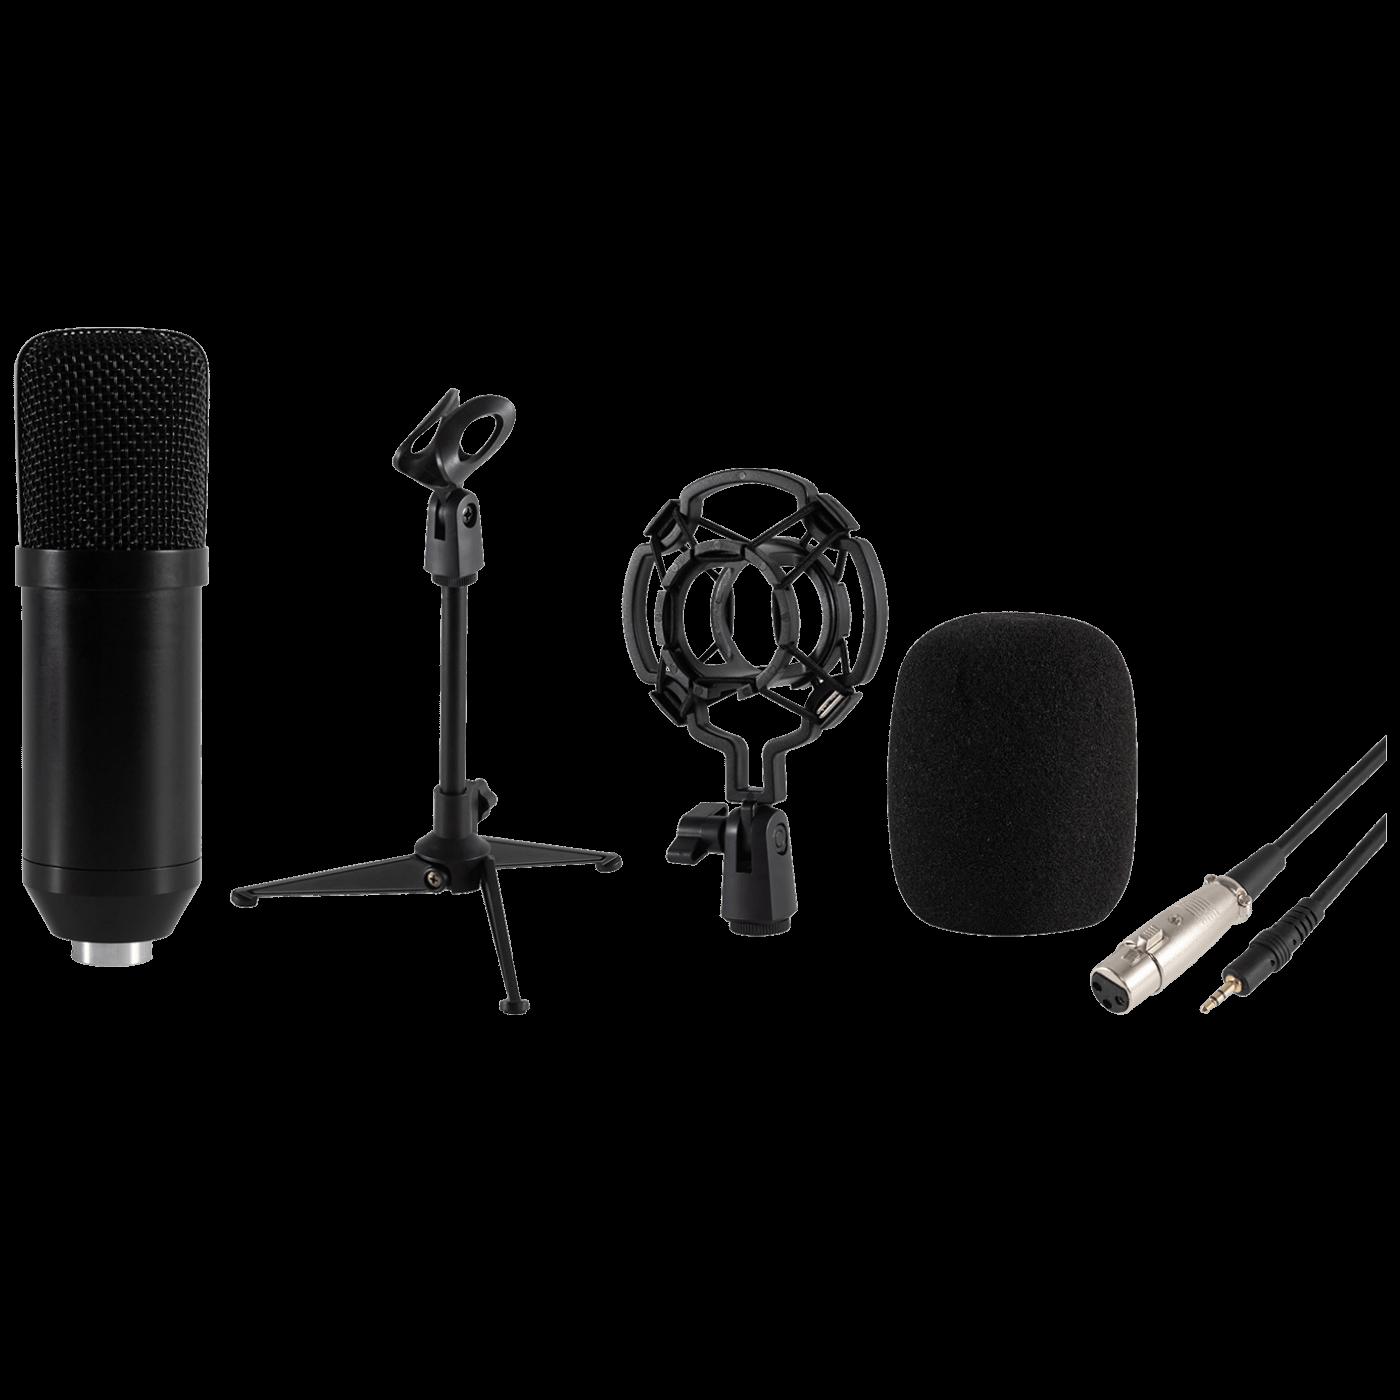 Mikrofon, studijski, sa postoljem, 3.5 mm, 2.4 met.